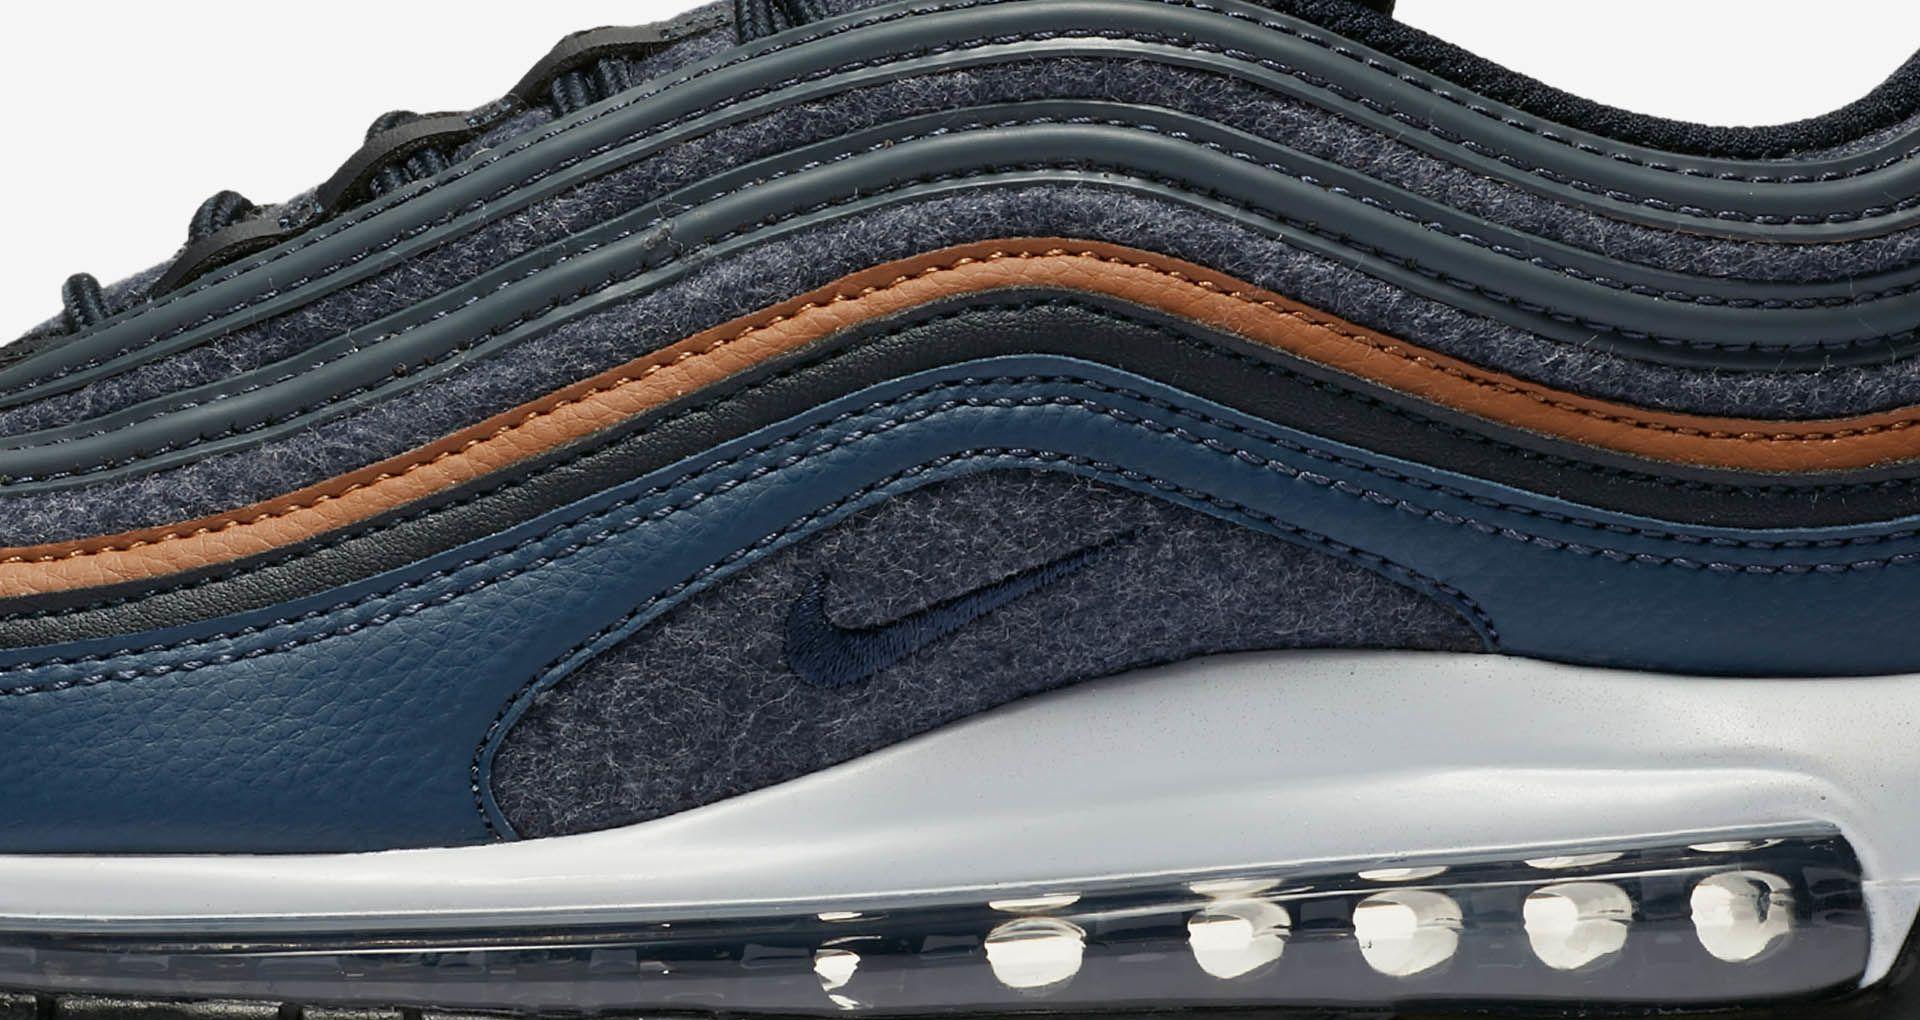 8decd90ef2 Nike Air Max 97 Premium 'Thunder Blue & Dark Obsidian' Release Date